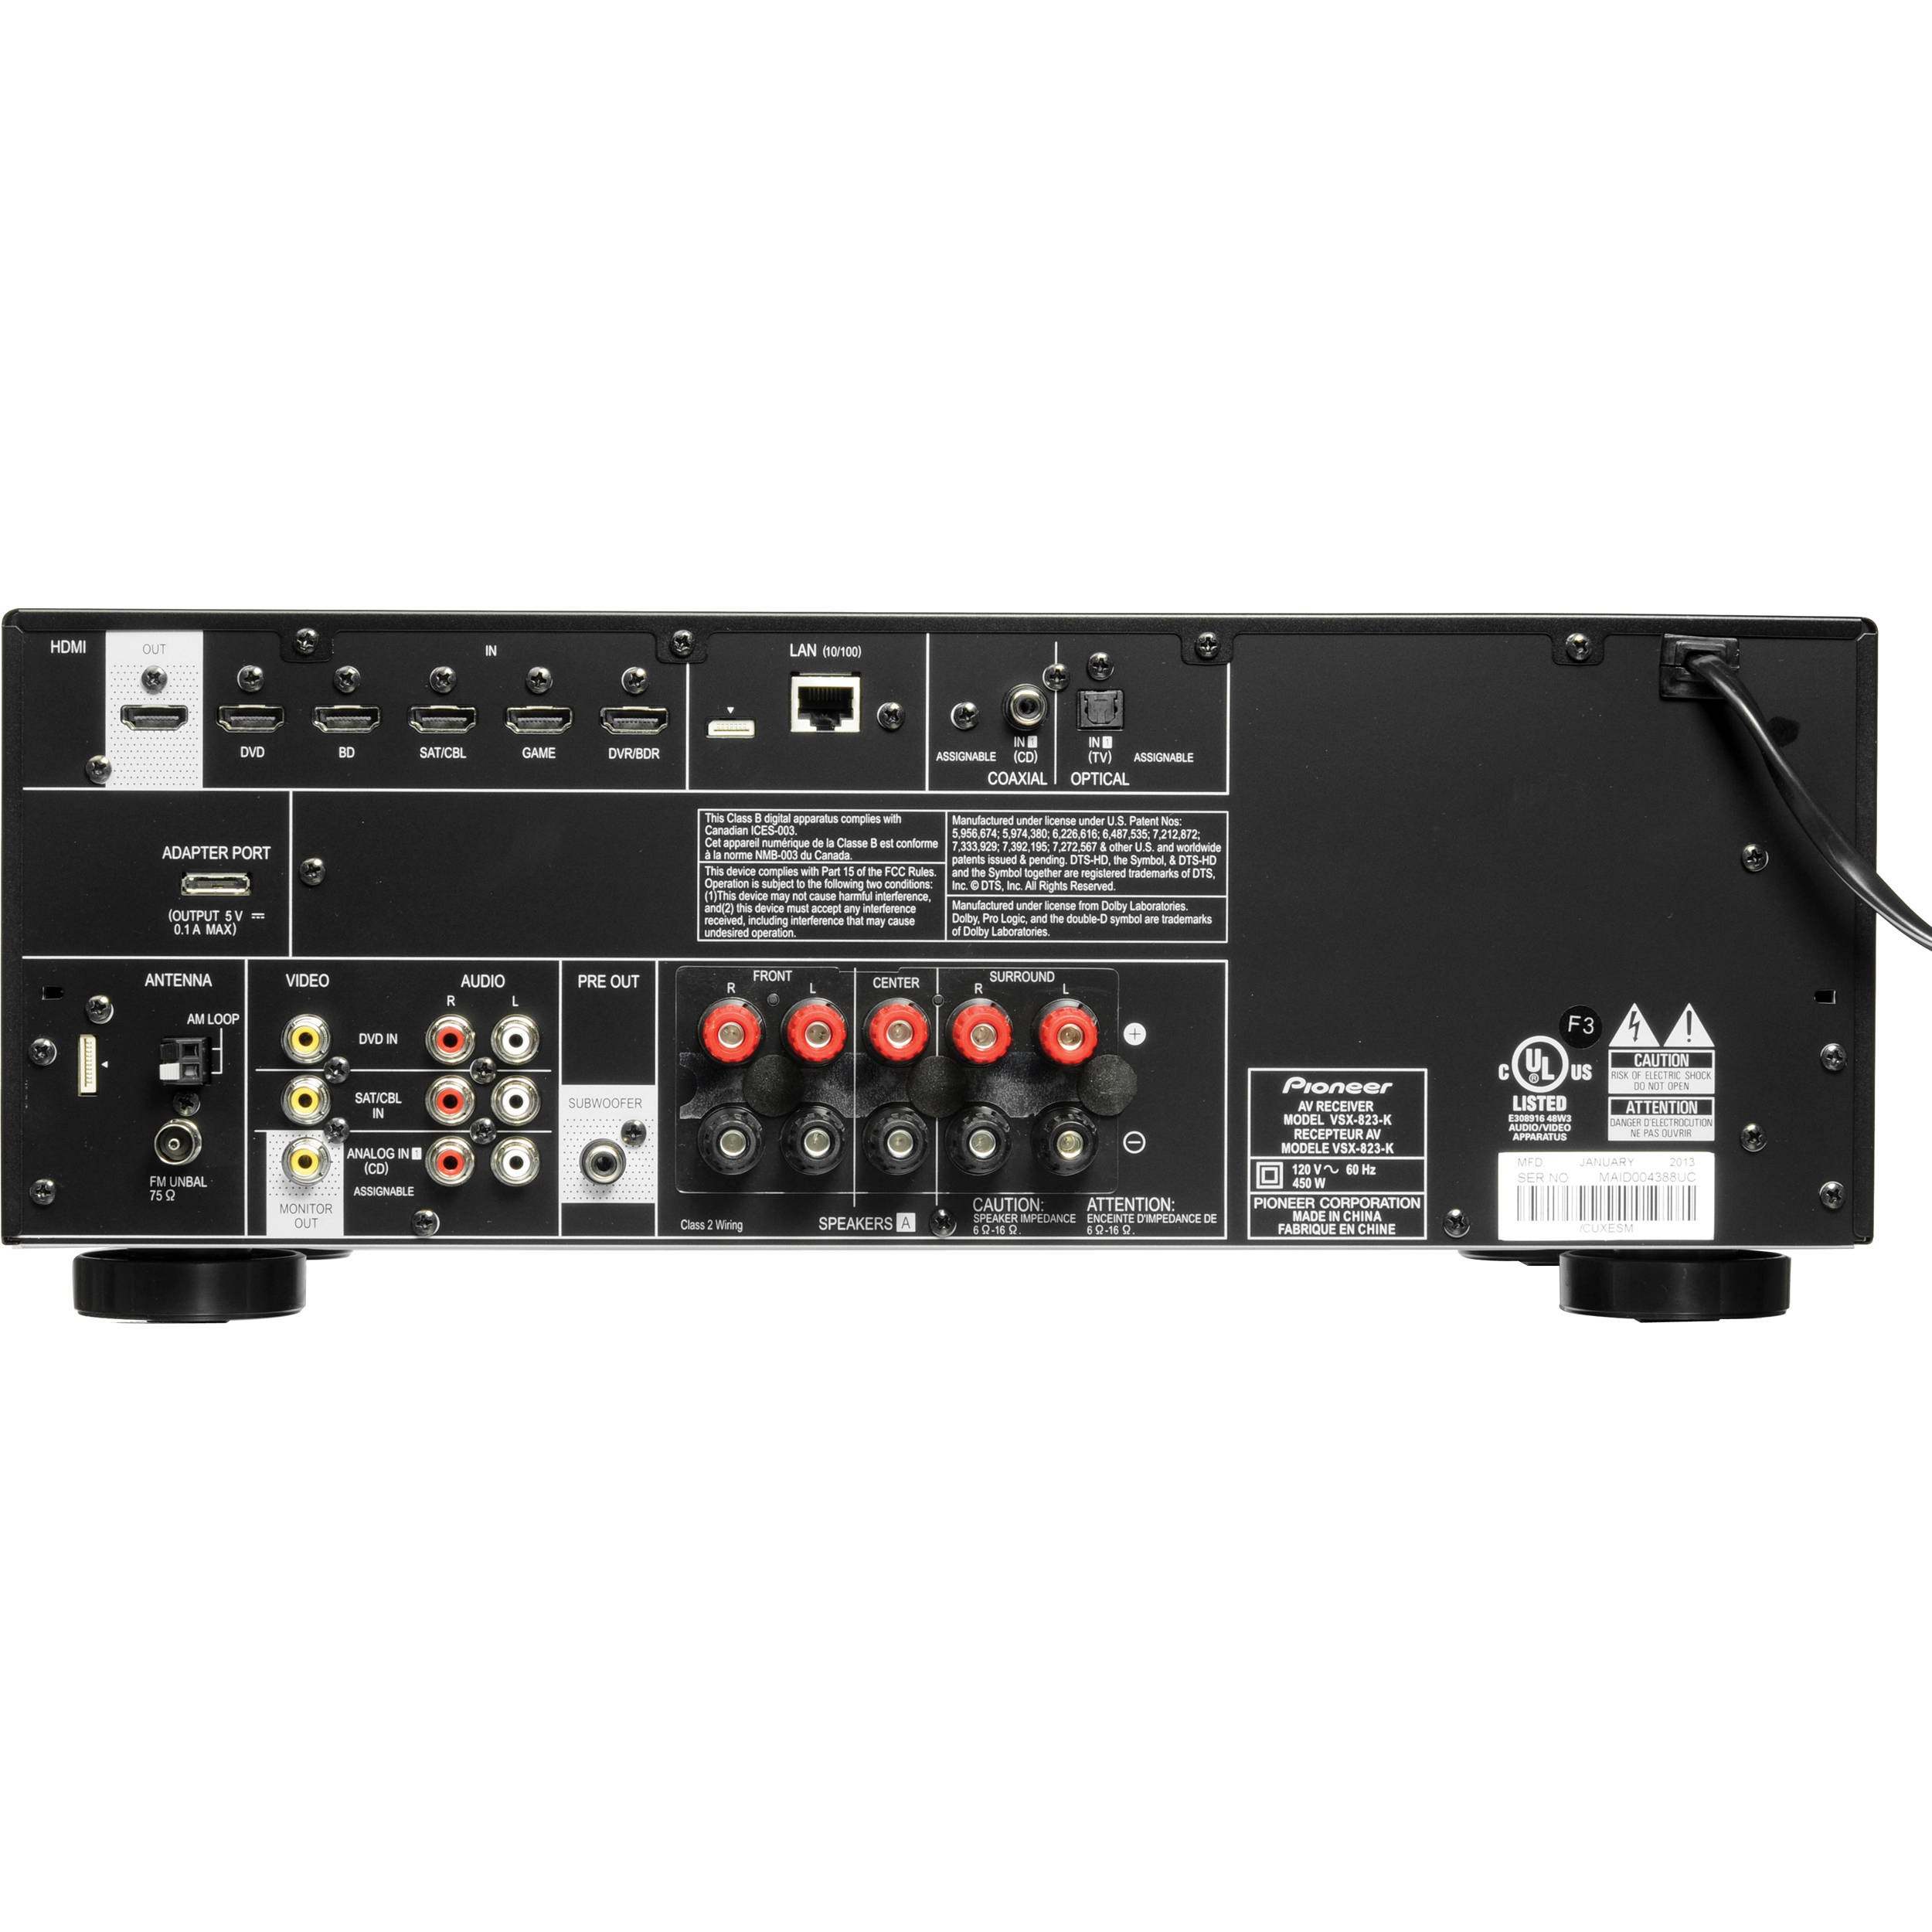 Pioneer VSX-823-K 5 1-Channel Network Ready AV Receiver